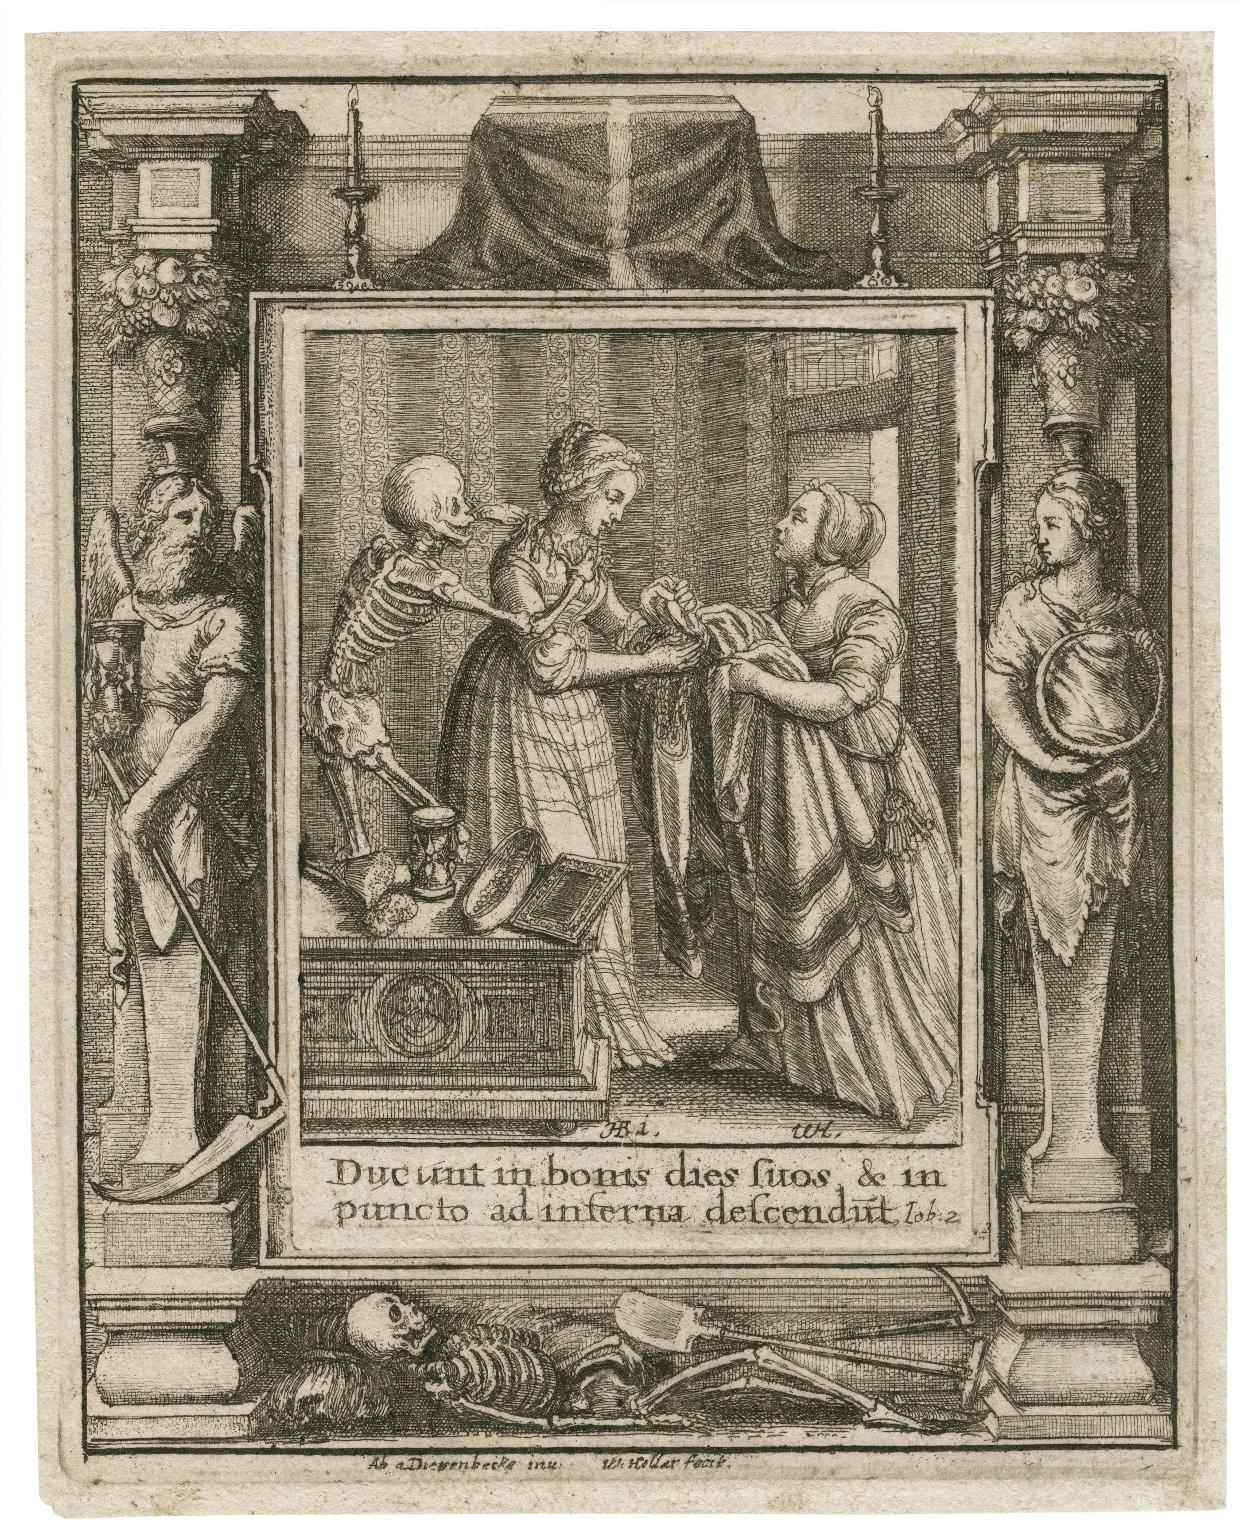 Ducunt in bonis dies suos & in puncto ad inferna descendut, Iob. 2 [graphic] / H.B. i. [center plate] ; W.H. [center plate] ; Ab. a Diepenbecke inu. [border] ; W. Hollar fecit [border].